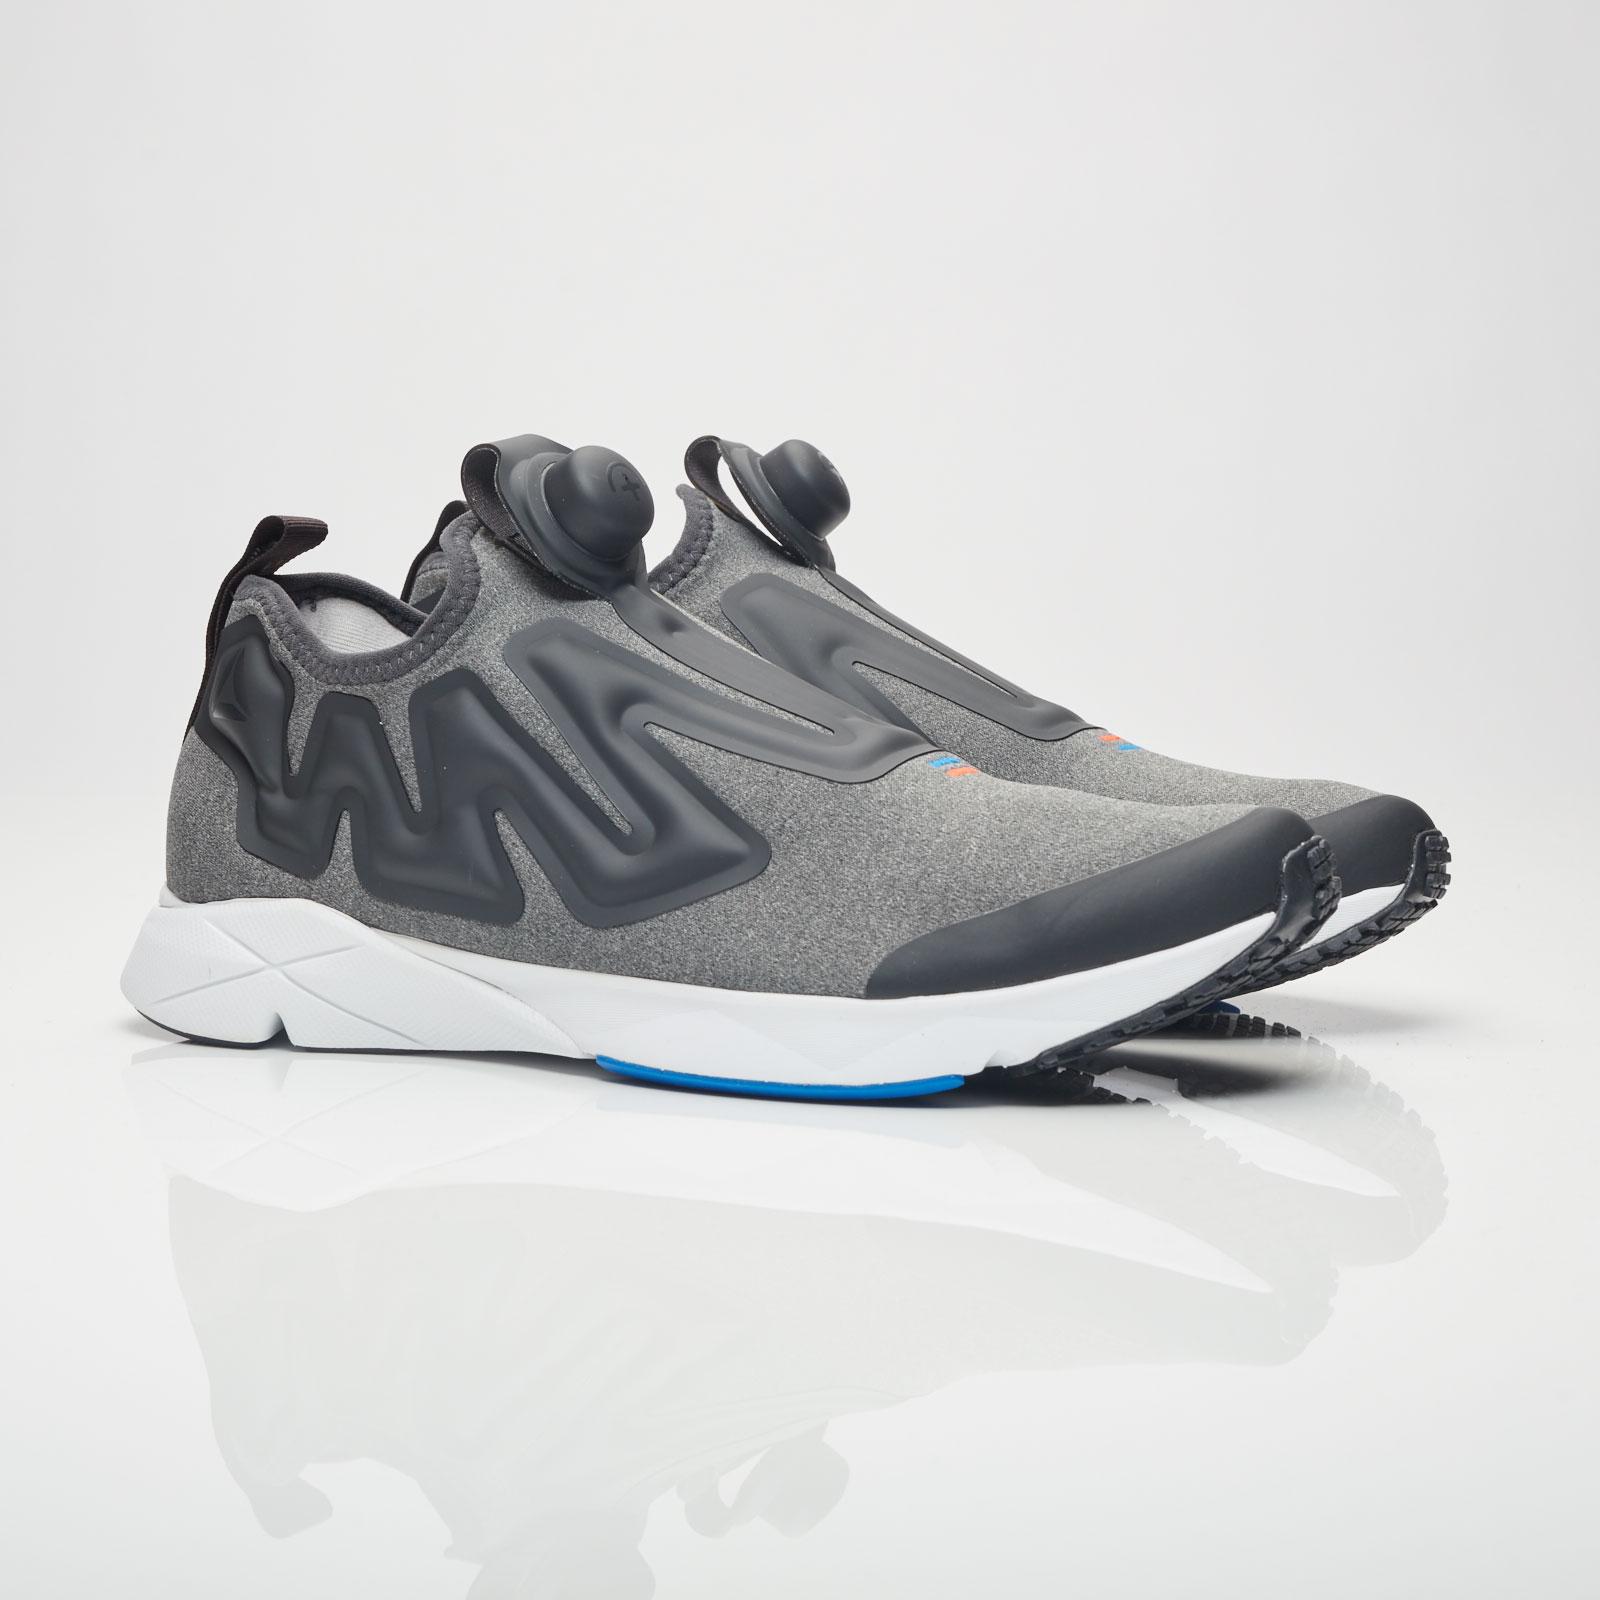 f91a7625e22c5 Reebok Pump Plus Supreme Hoodie - Bs7044 - Sneakersnstuff